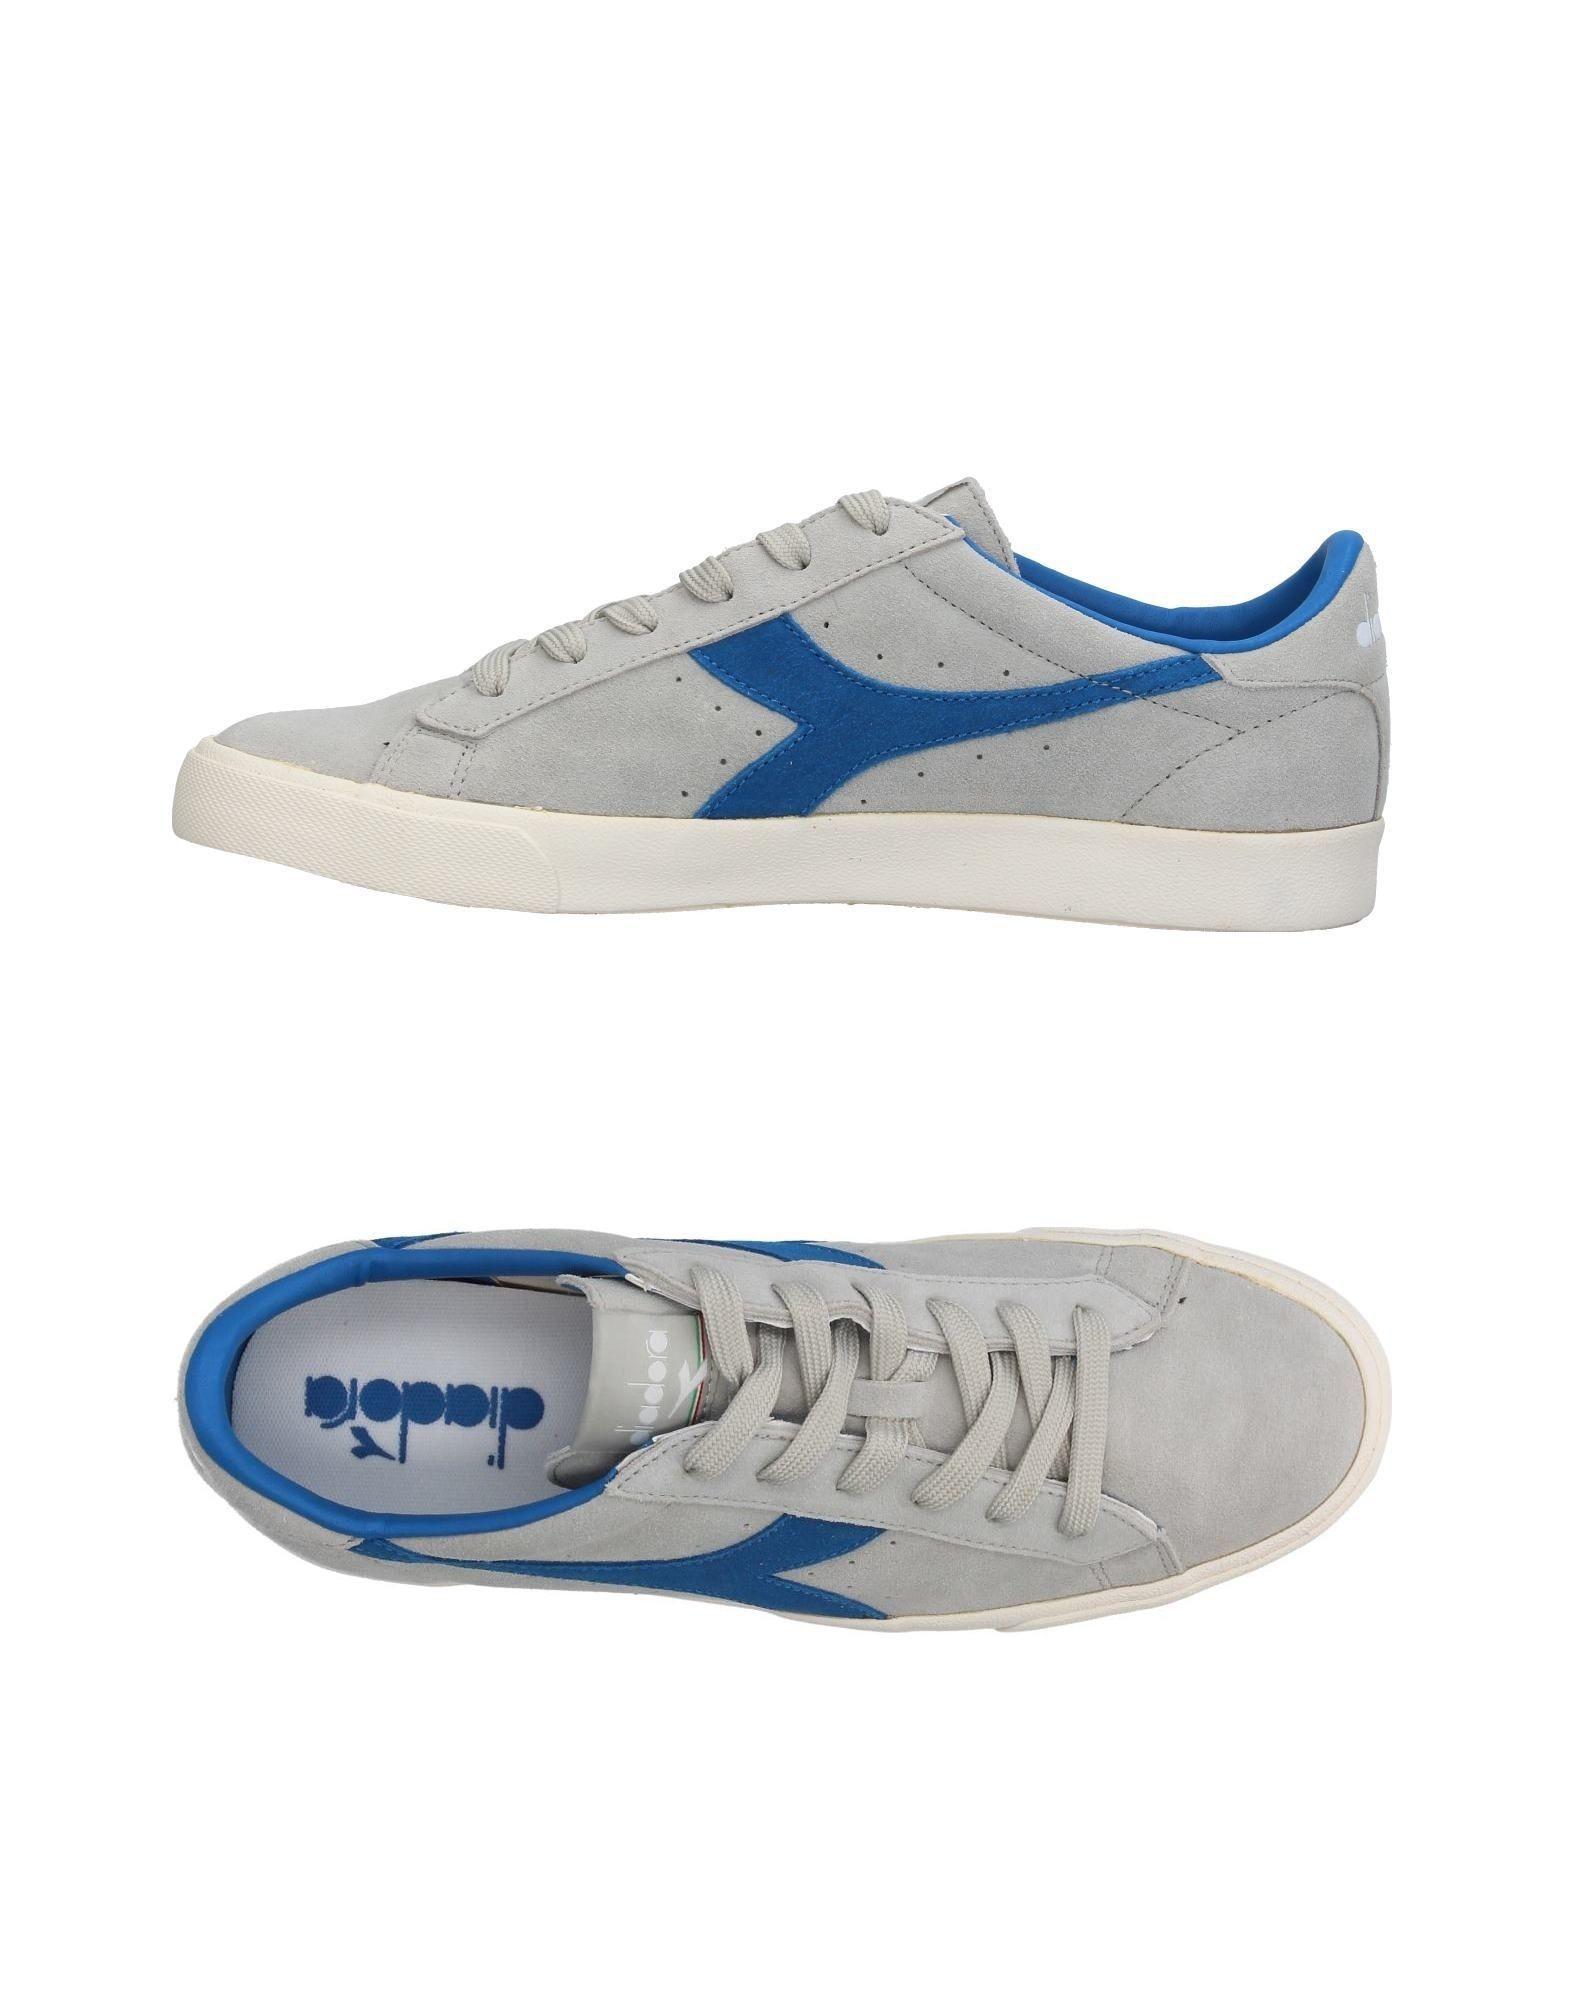 aa0fd71d Diadora, Light Grey | Diadora Men | Pinterest | Кеды, Кроссовки и Обувь